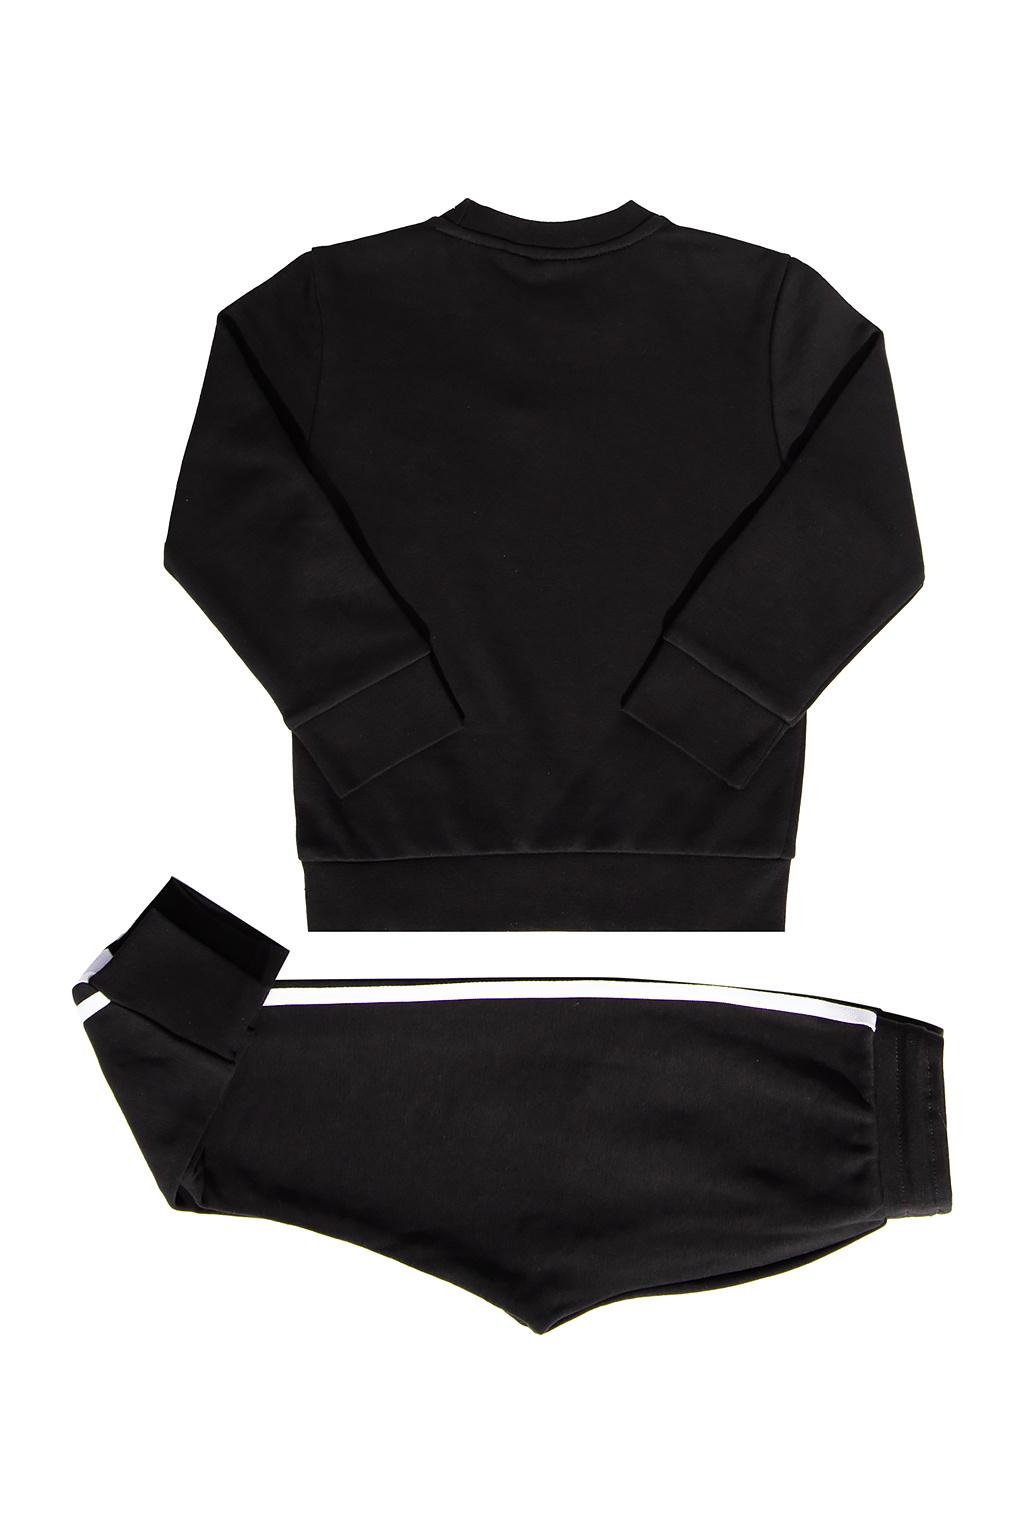 ADIDAS Kids Sweatshirt & sweatpants set